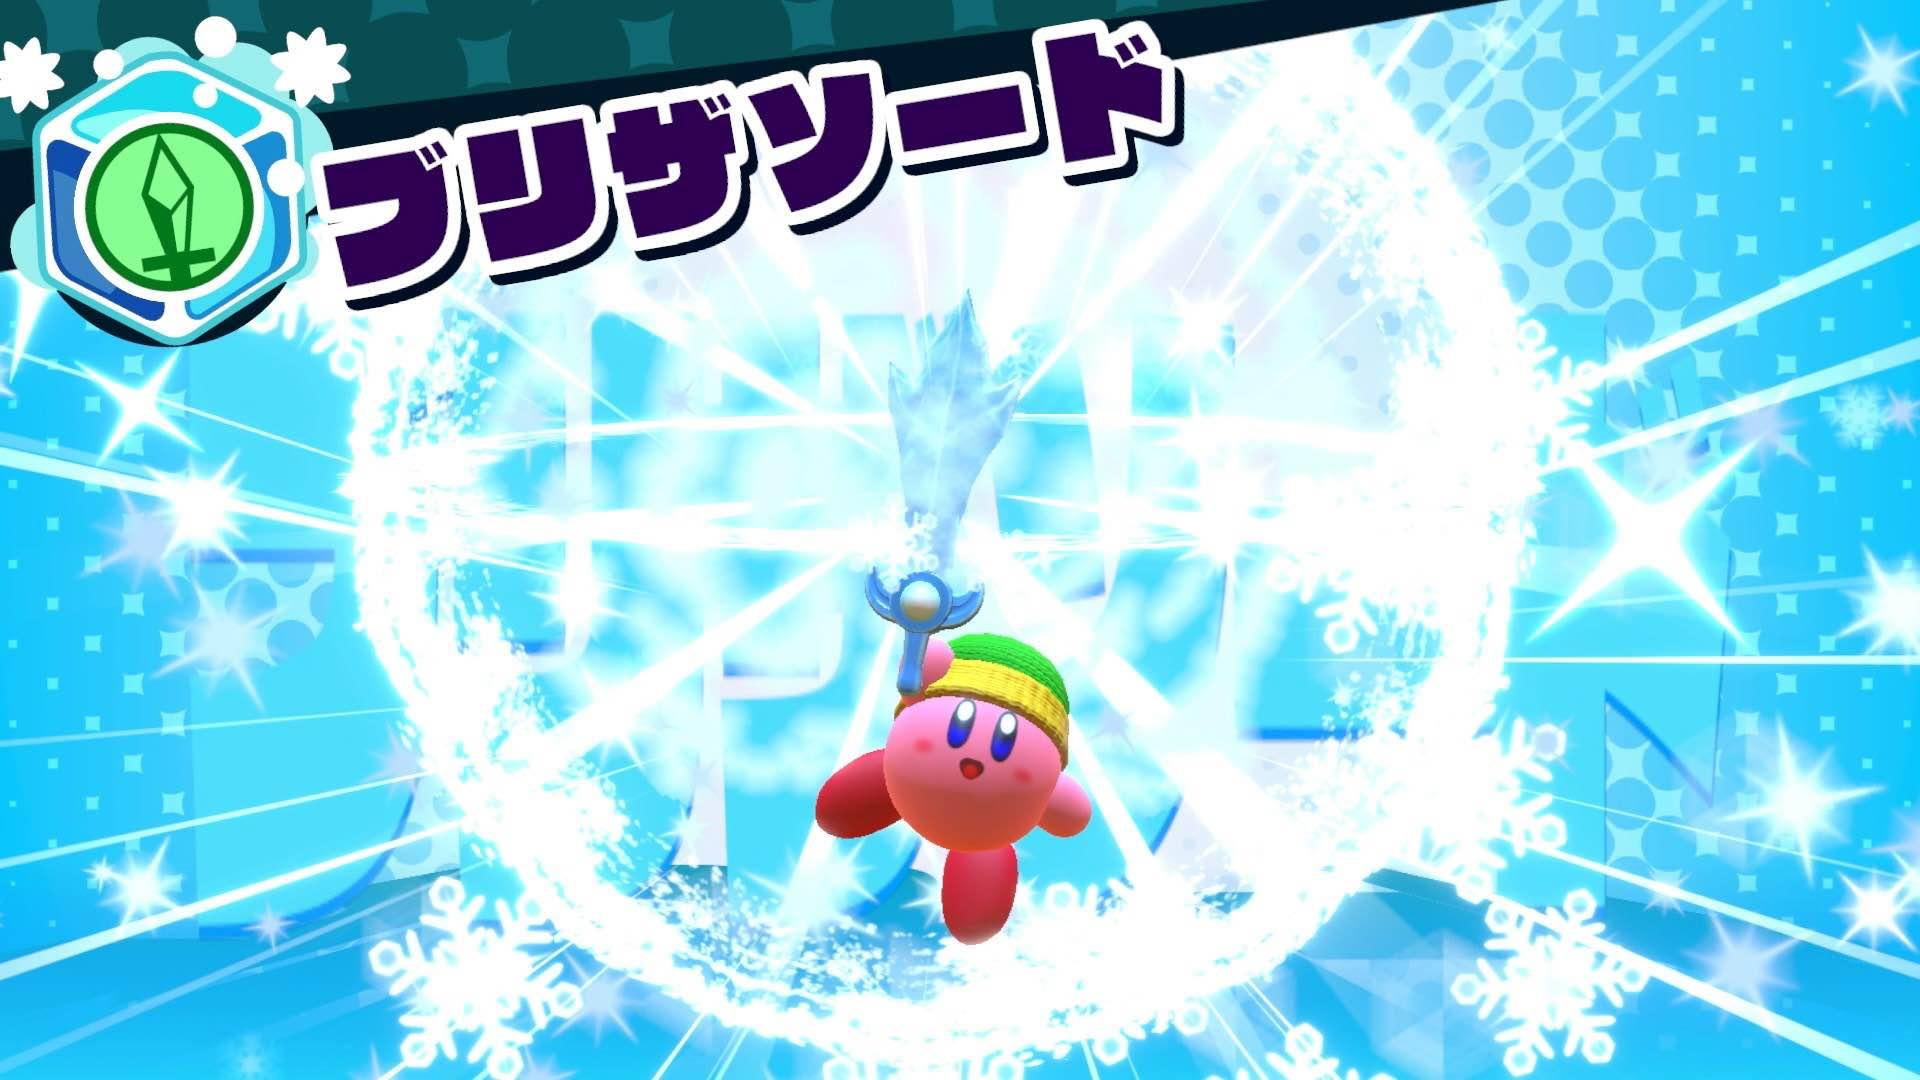 Switch_KirbySA_ND0913_SCRN_05_bmp_jpgcopy